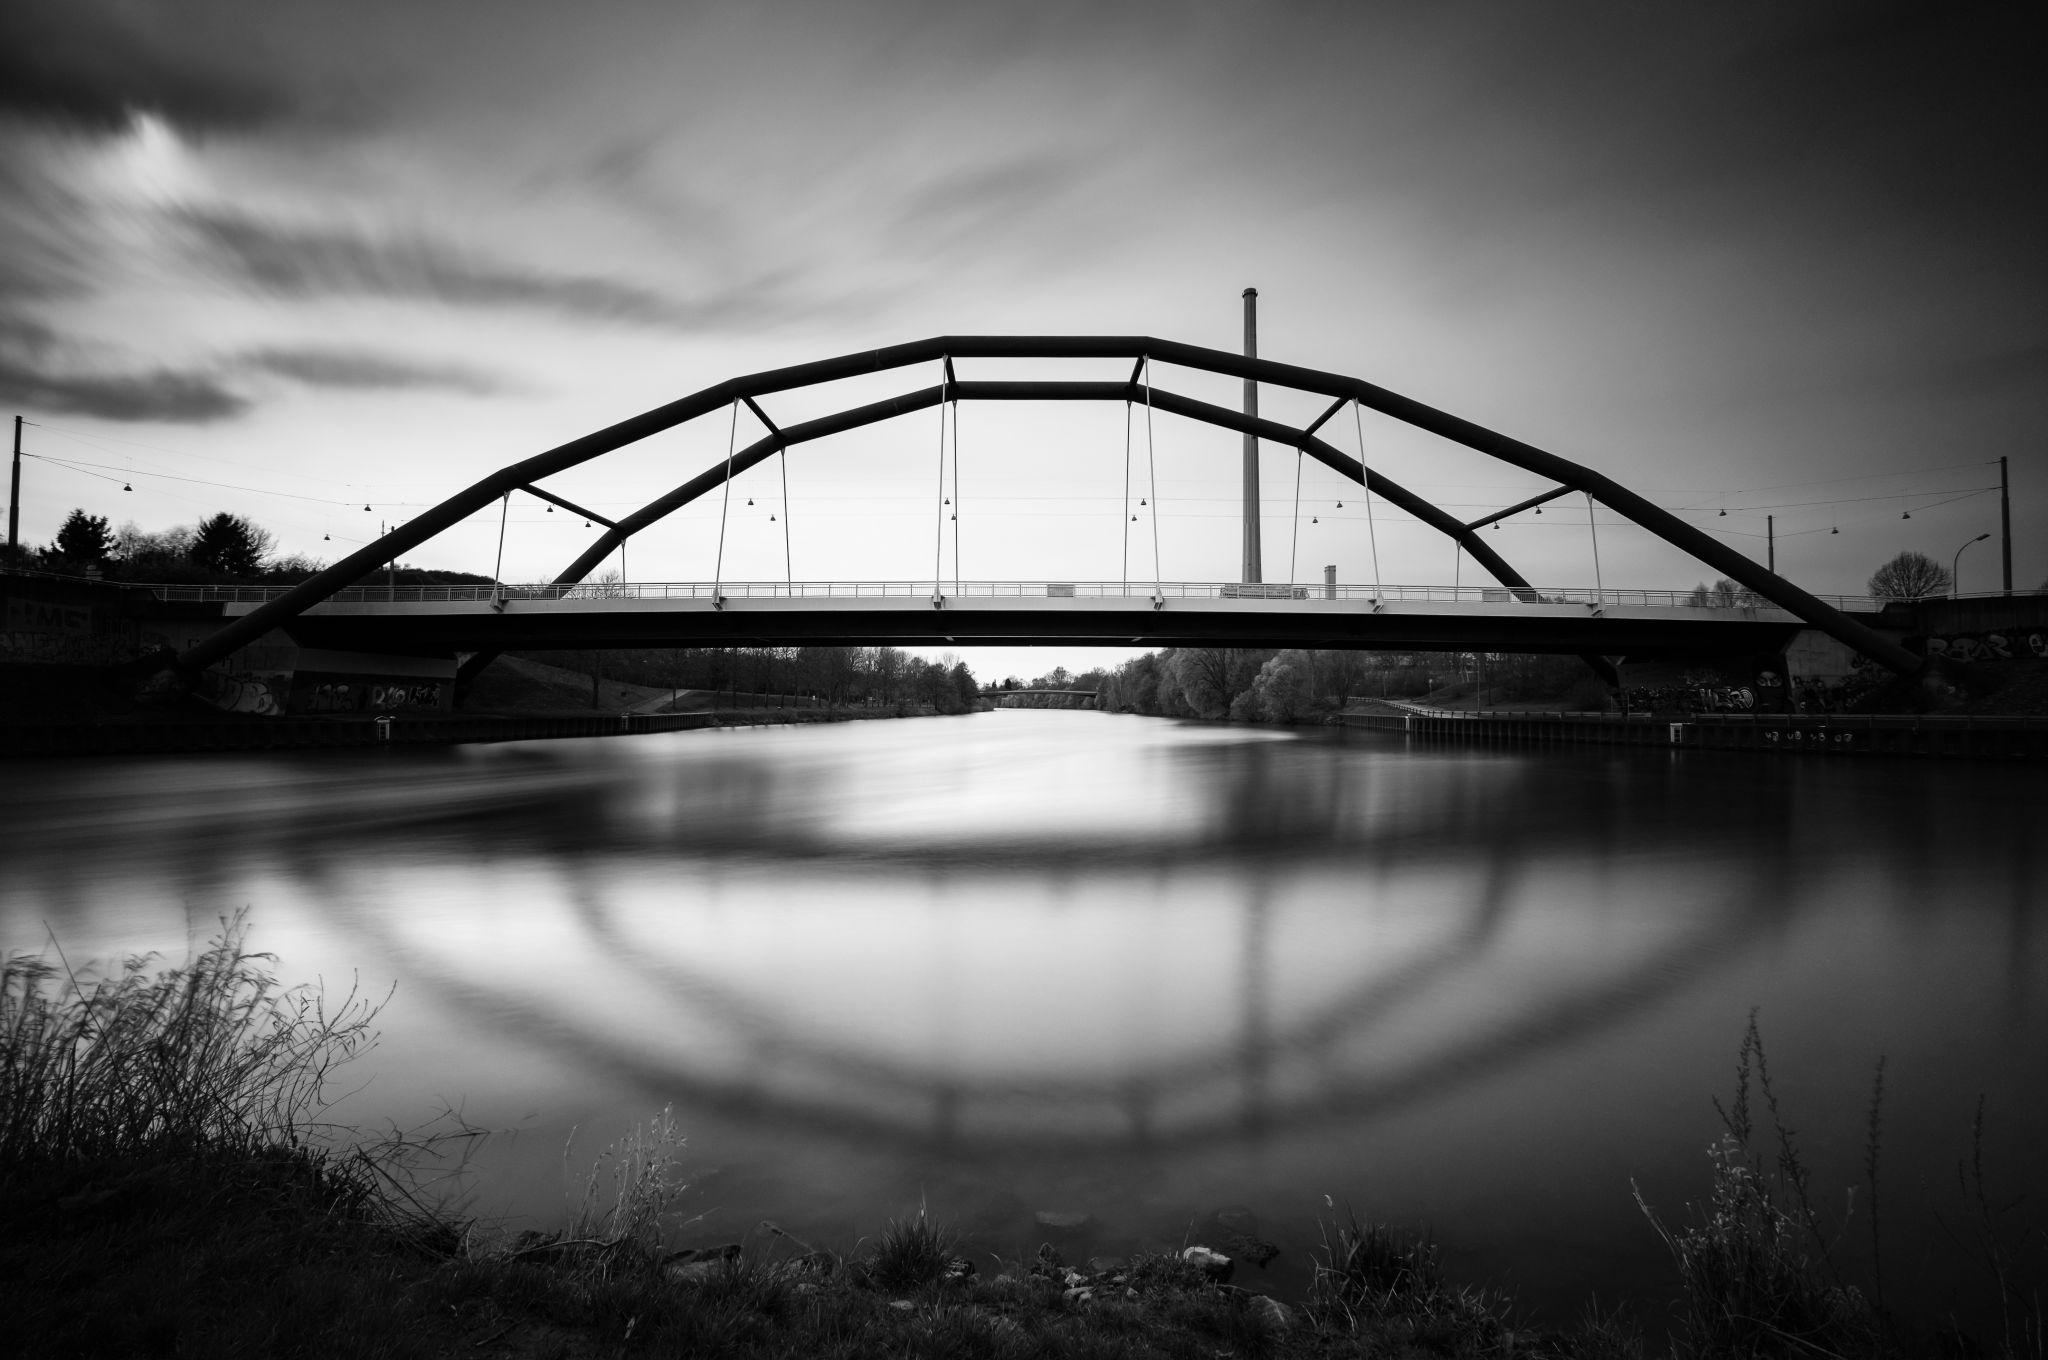 A view on the Ostspange Bridge, Germany